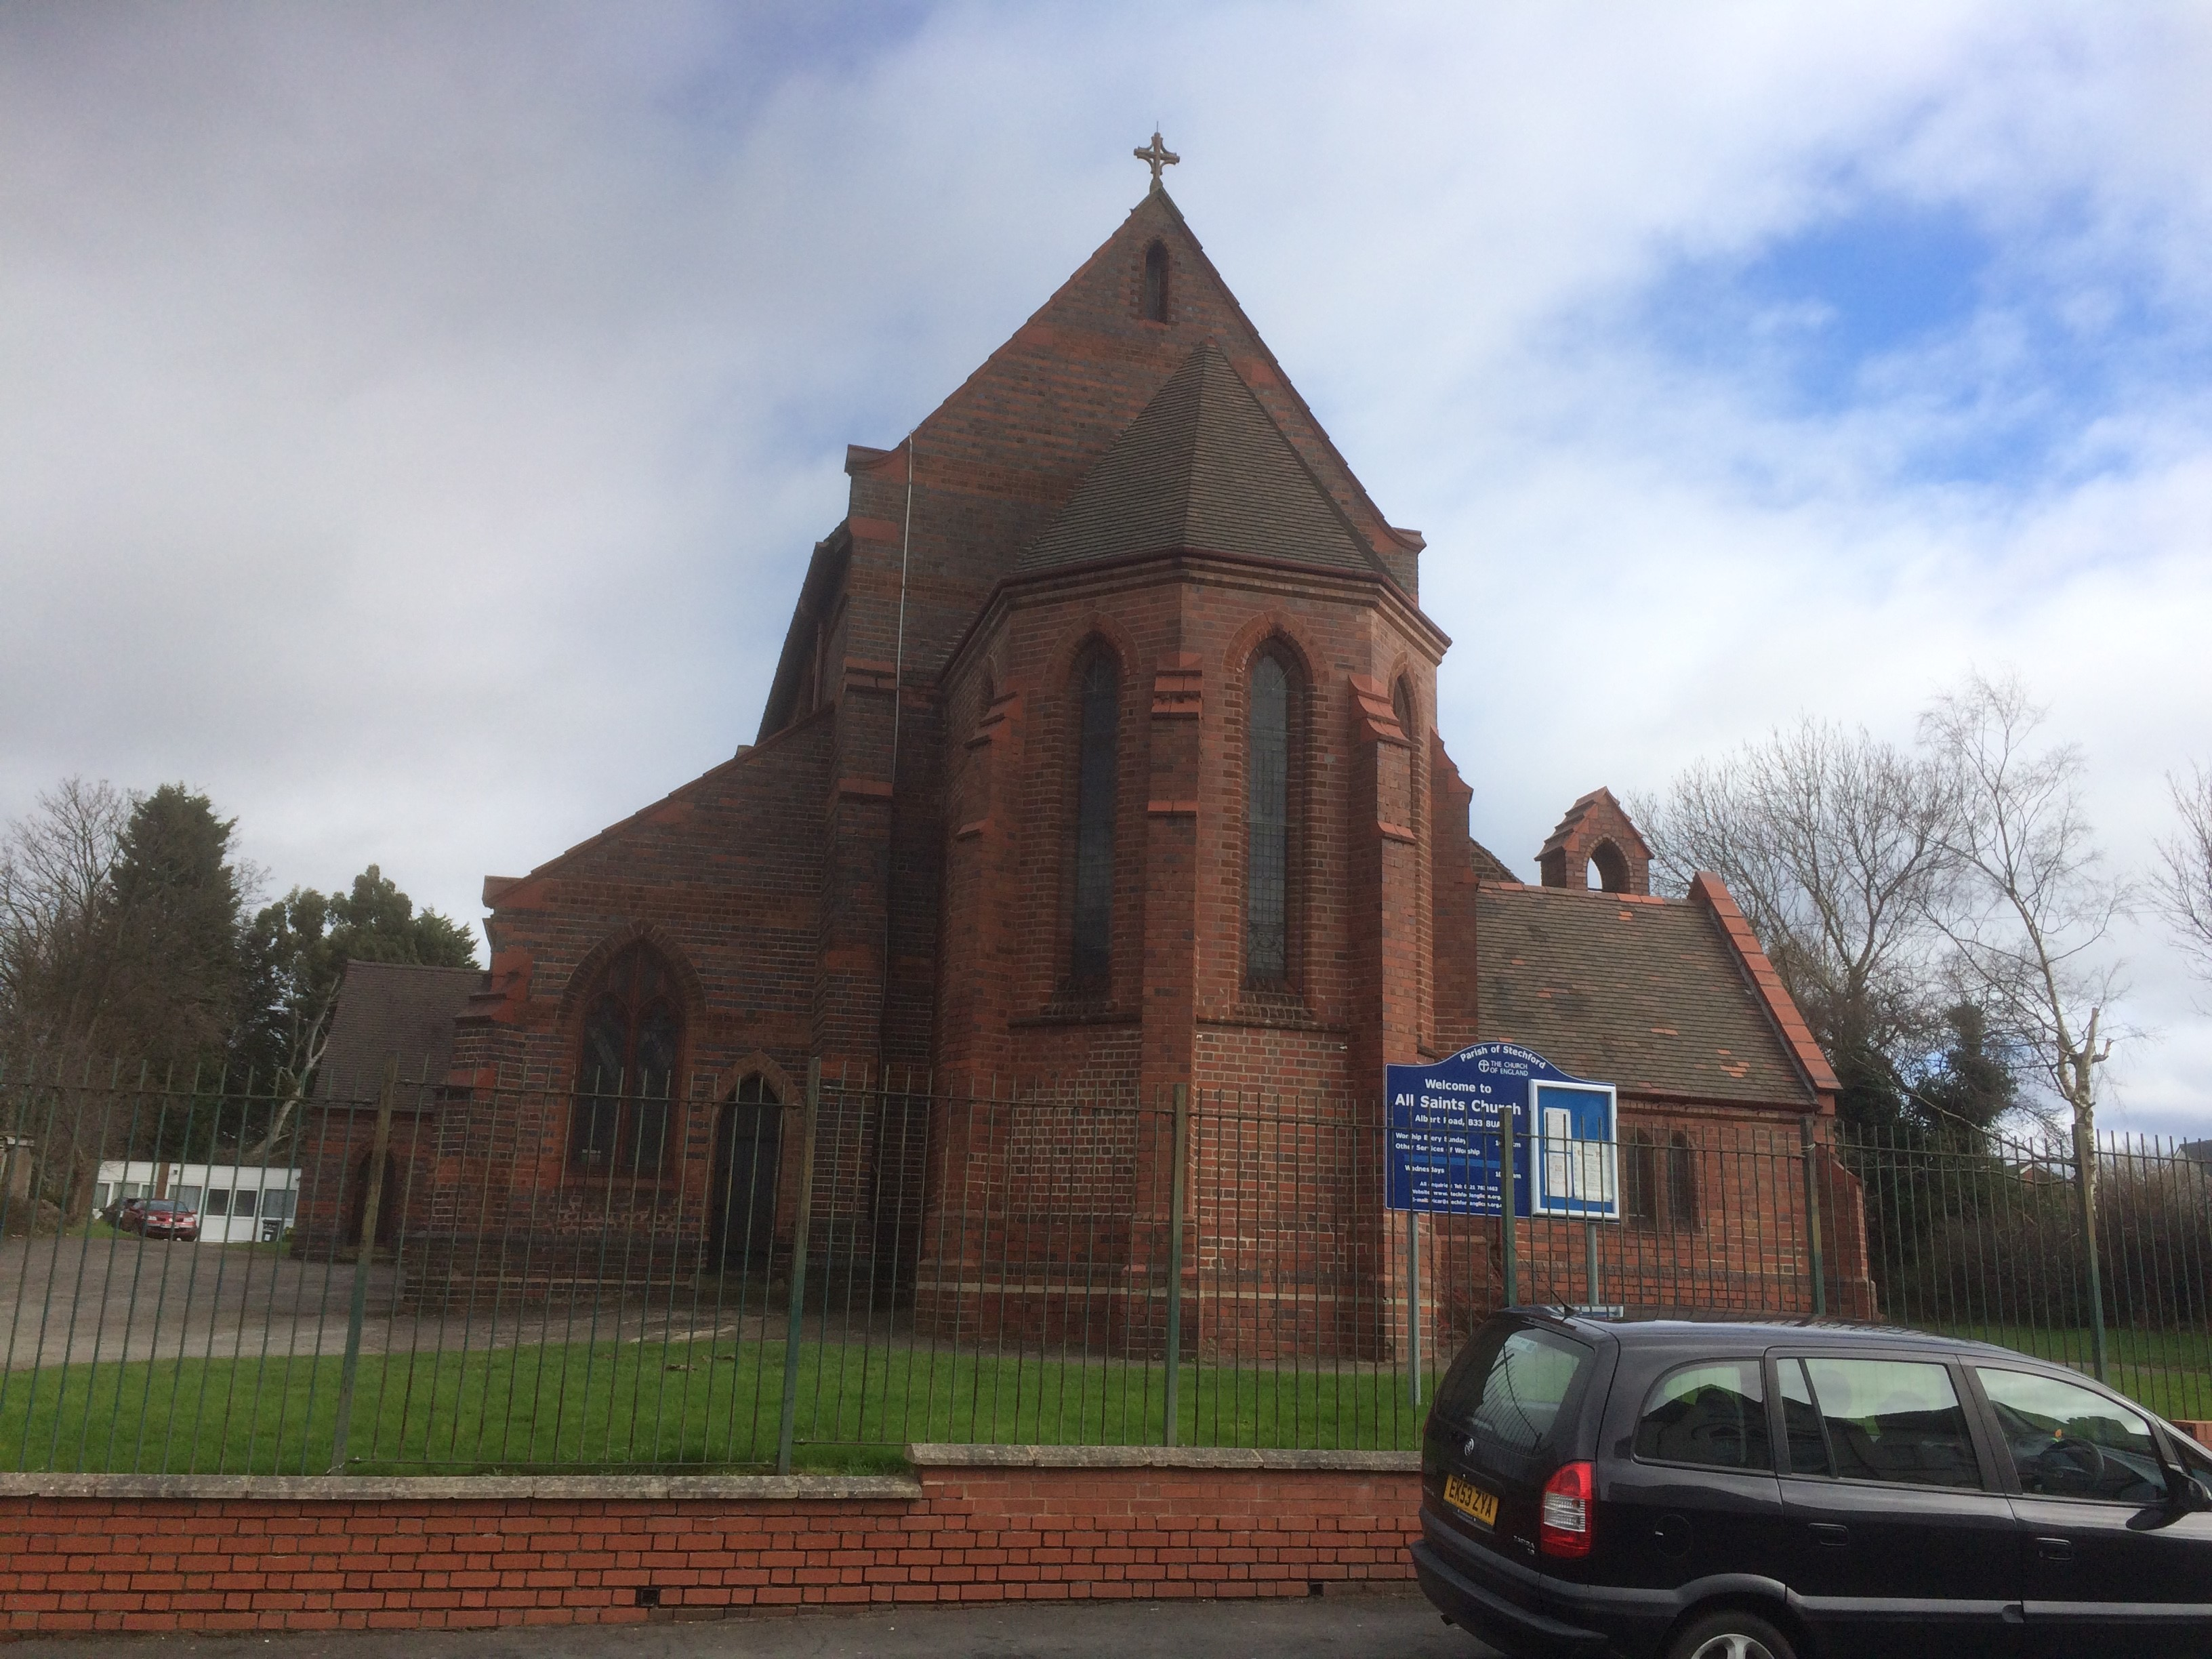 BIRMINGHAM, STECHFORD, All Saints